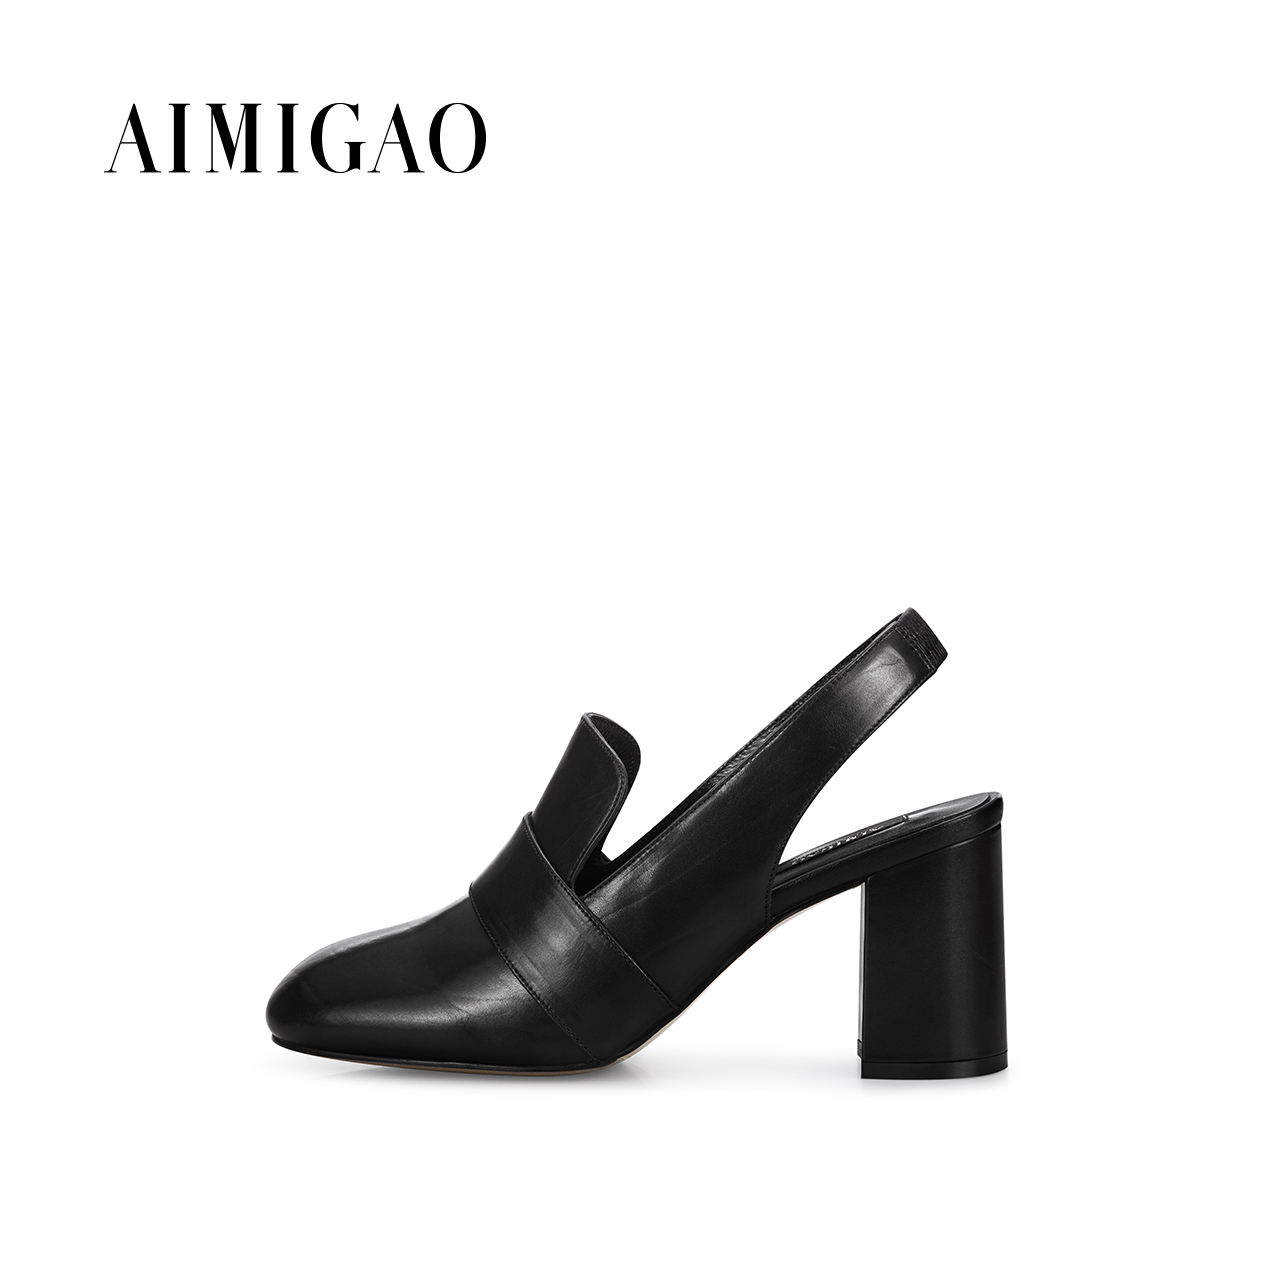 Босоножки Love/meter/high a27615407 AIMIGAO 2017